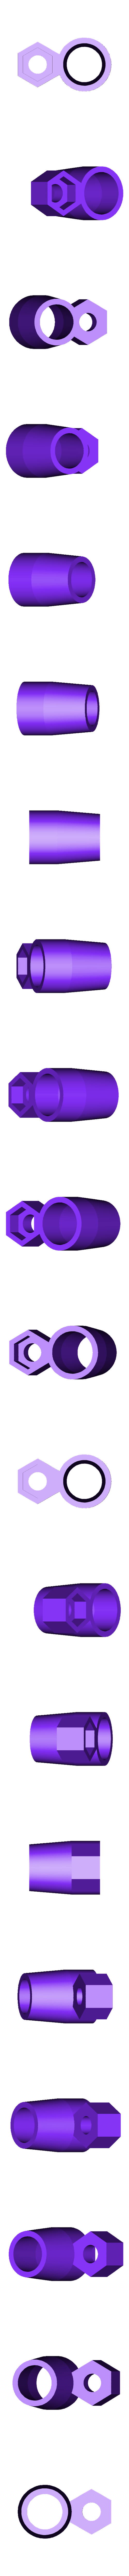 Case_holder_Pro1000.stl Download free STL file Pro1000 case holder replacement (.45 ACP single stack) • 3D print model, LionFox